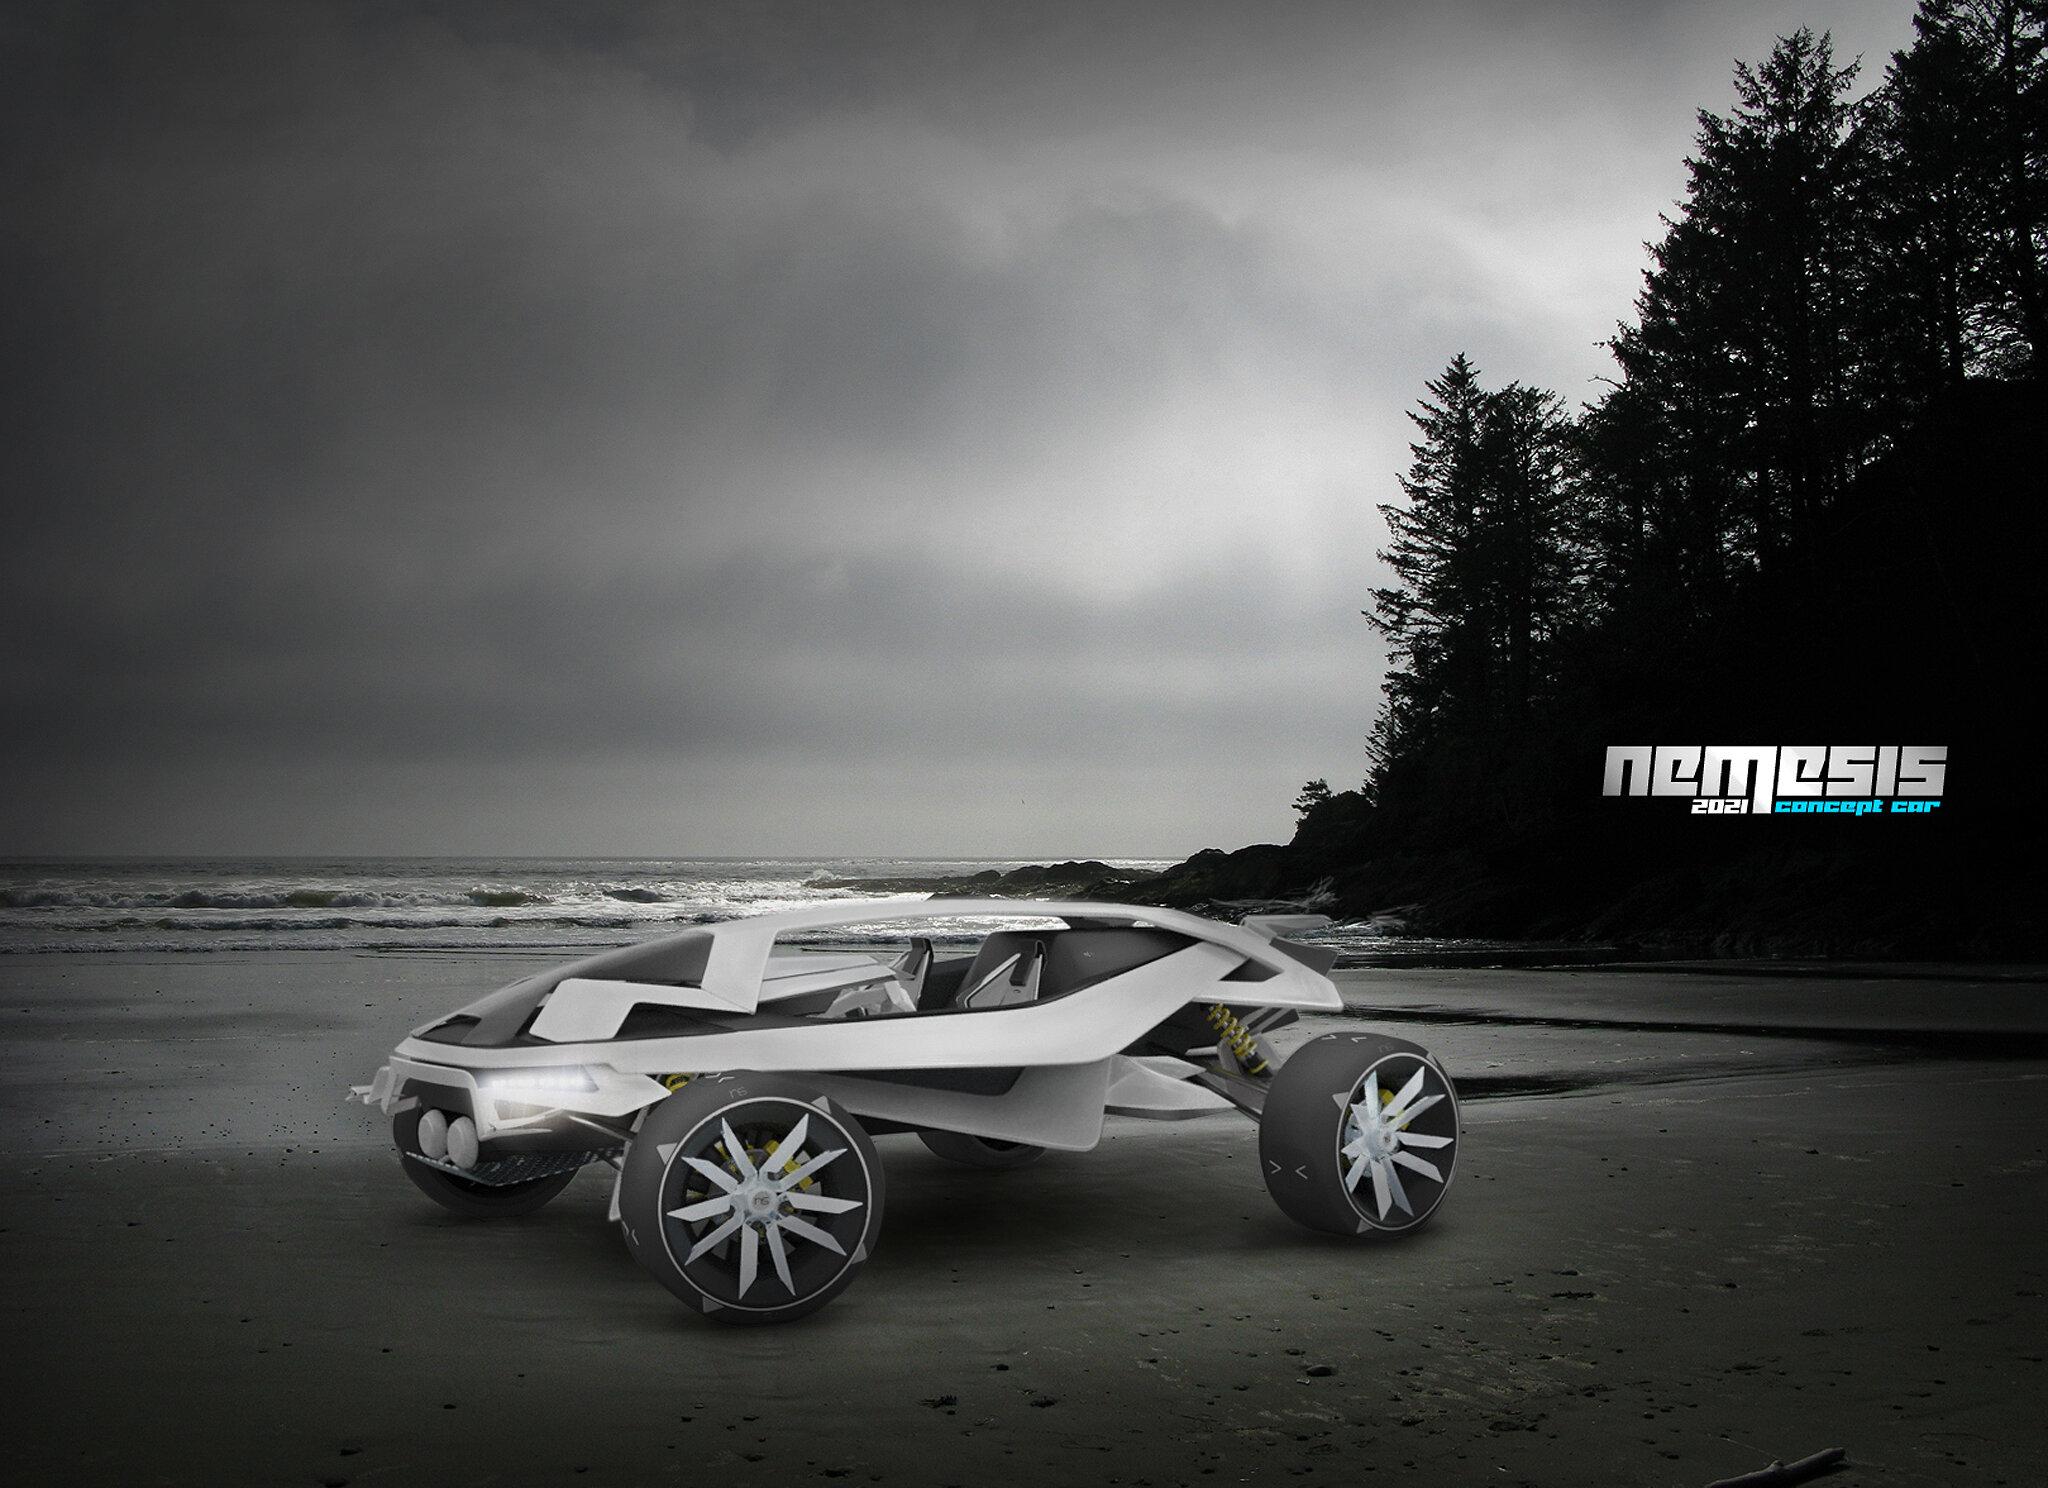 Nemesis_concept_car_final_06_source.jpg